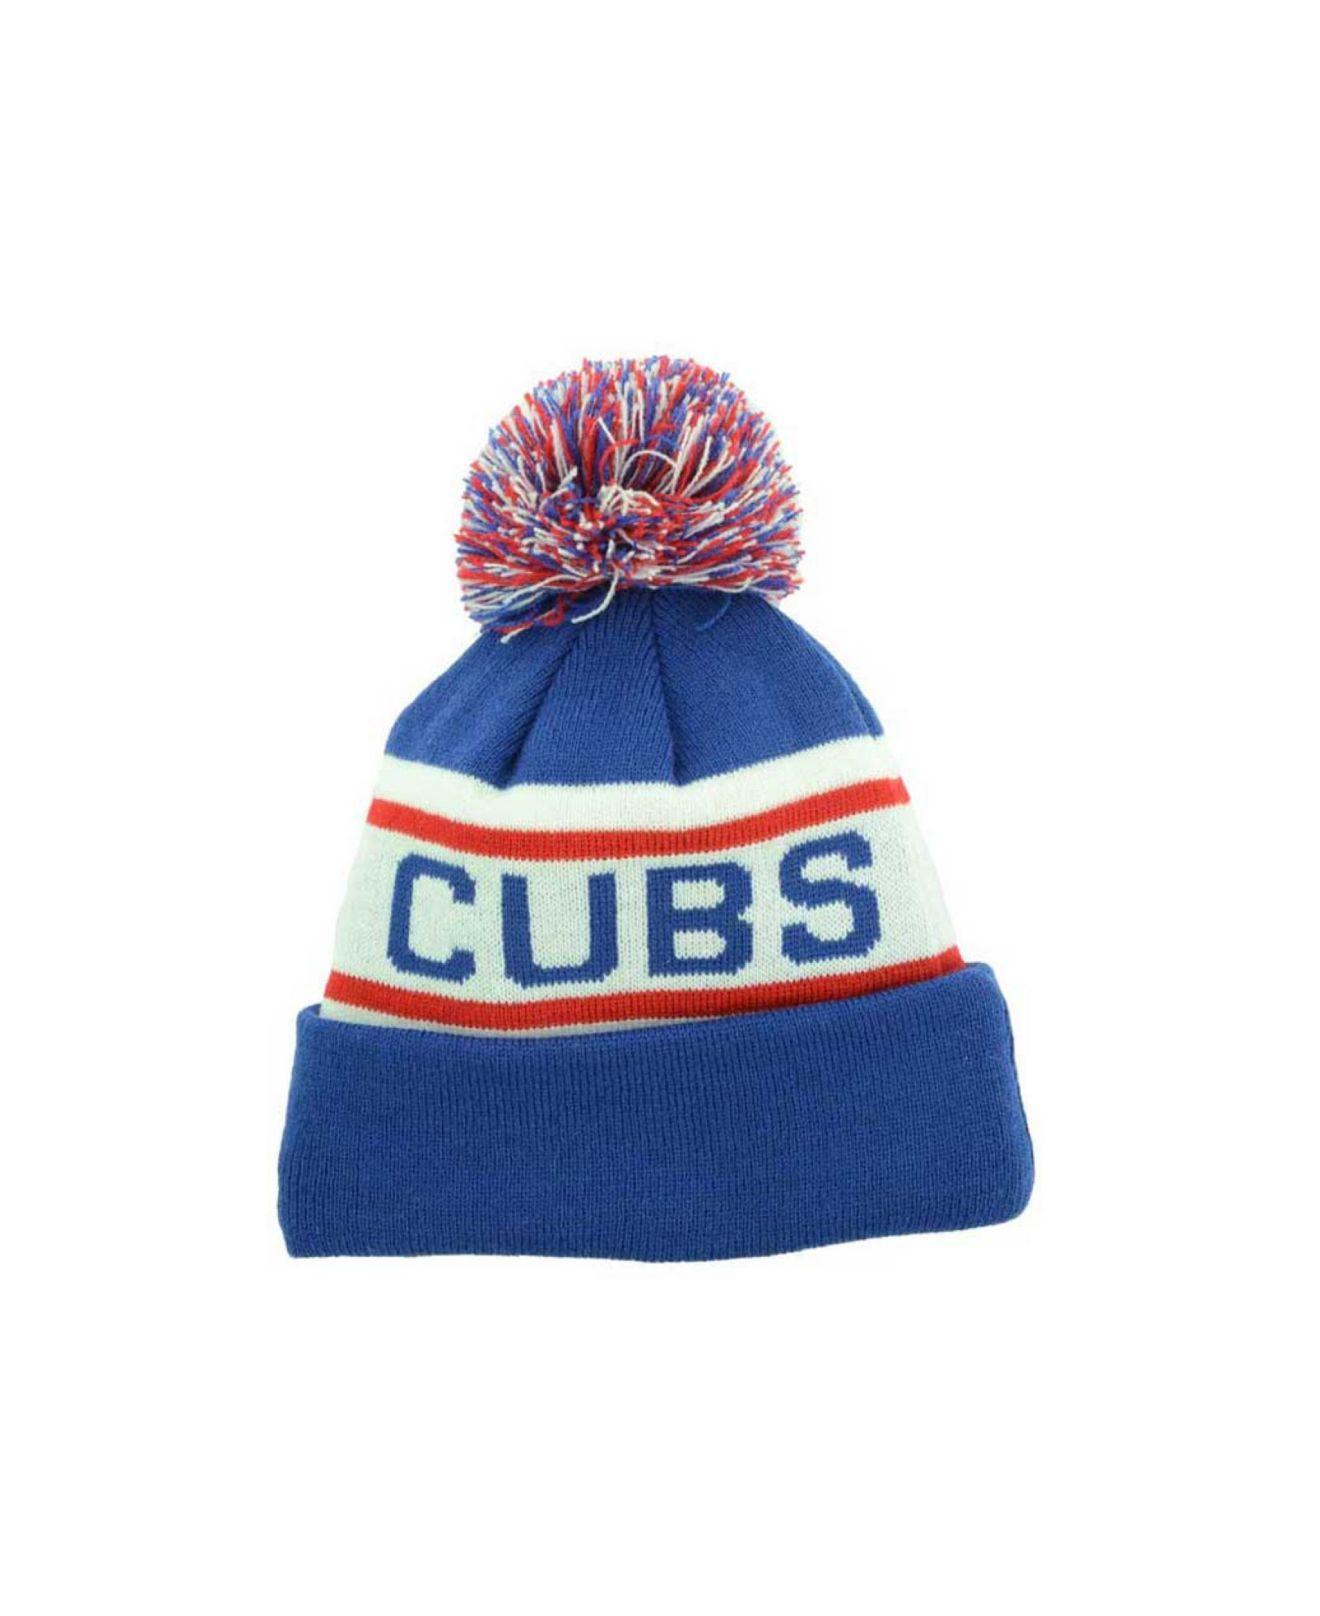 Lyst - KTZ Kids  Chicago Cubs Biggest Fan Knit Hat in Blue for Men 26bb940a26b